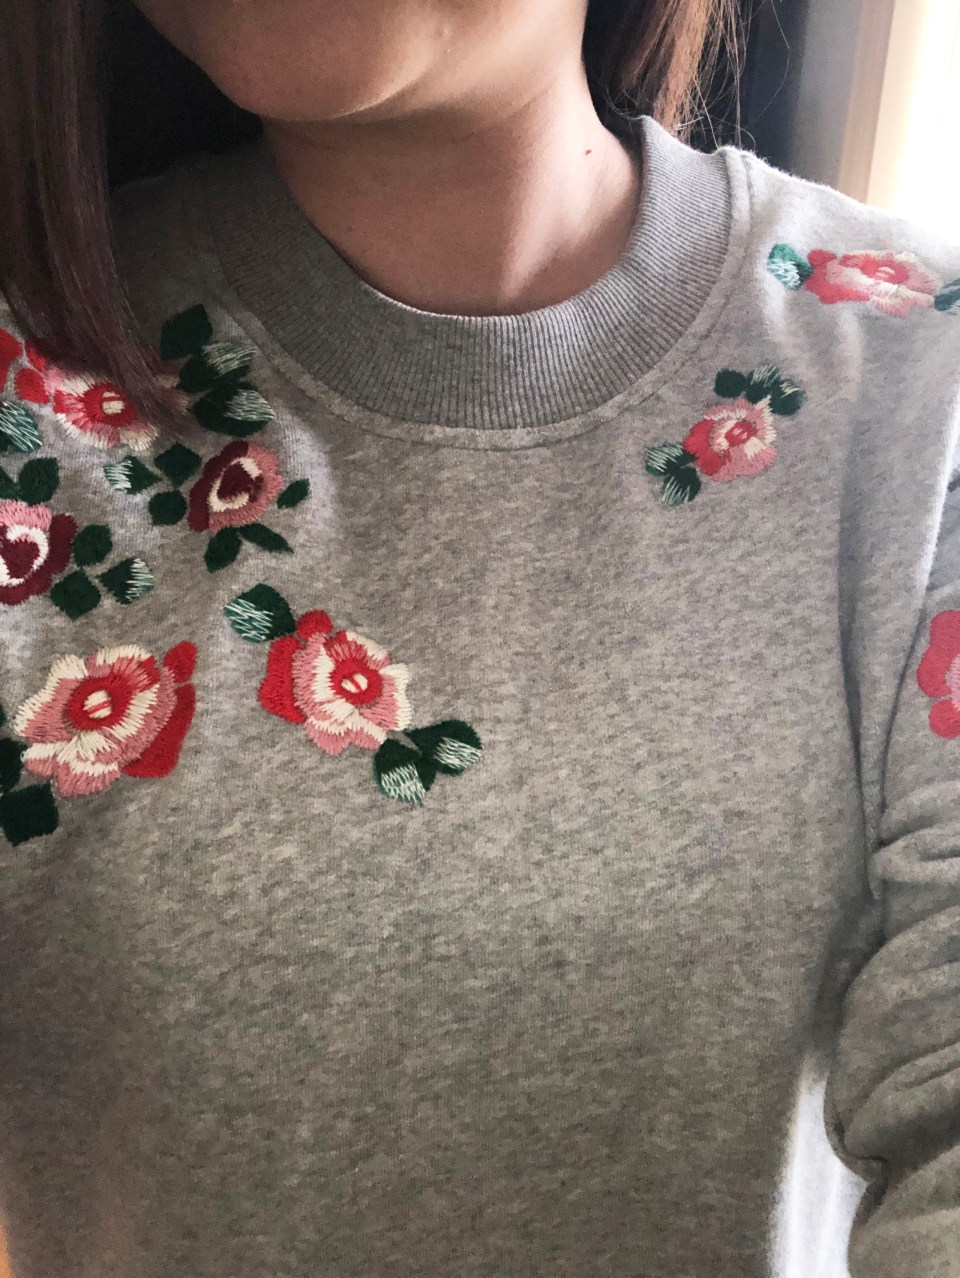 Floral Embroidered Sweatshirt 13